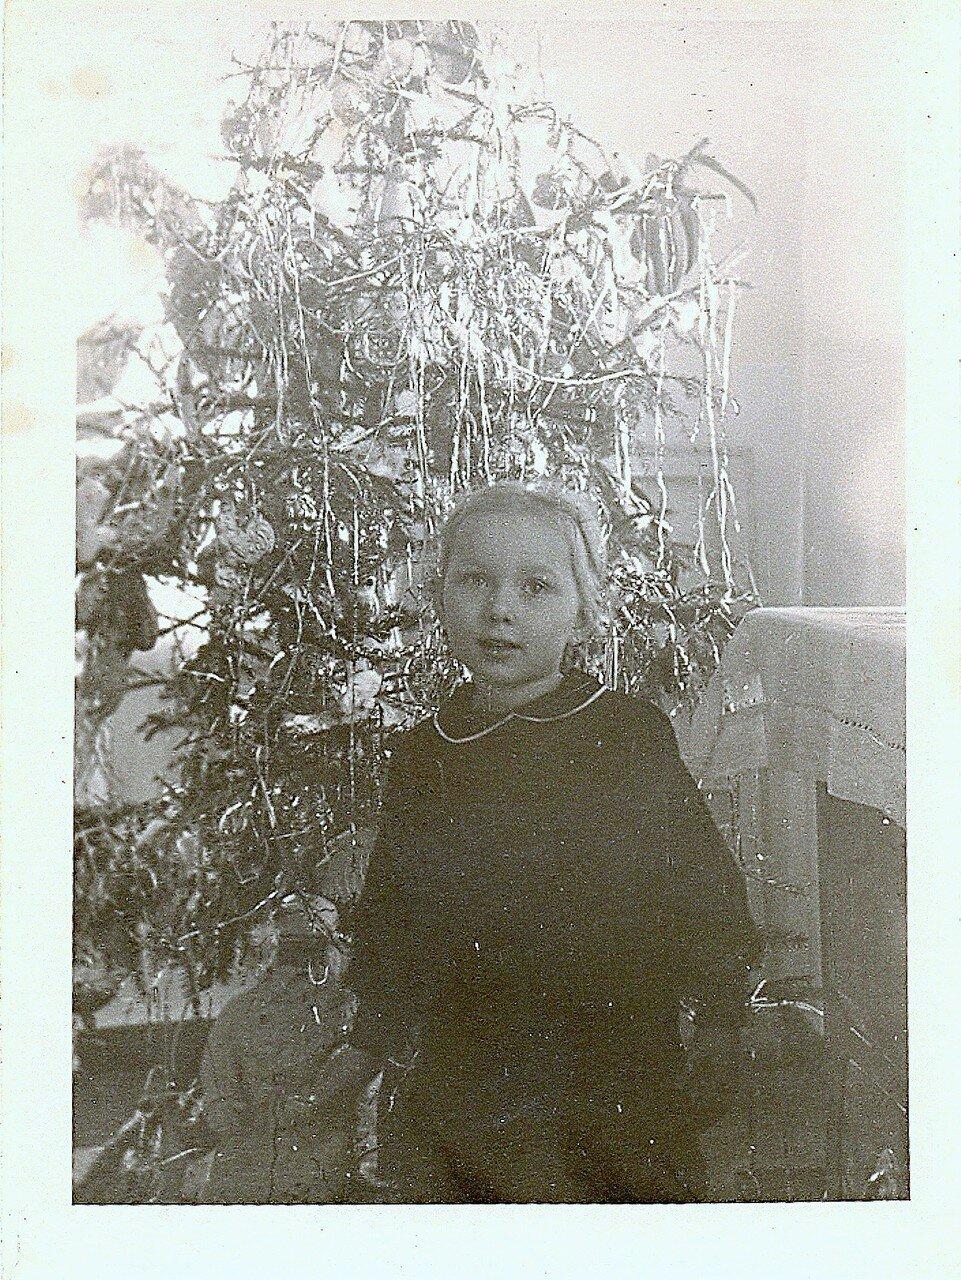 Галя из Амвросиевки у ёлки новогодней... Начало 60-х... .jpg